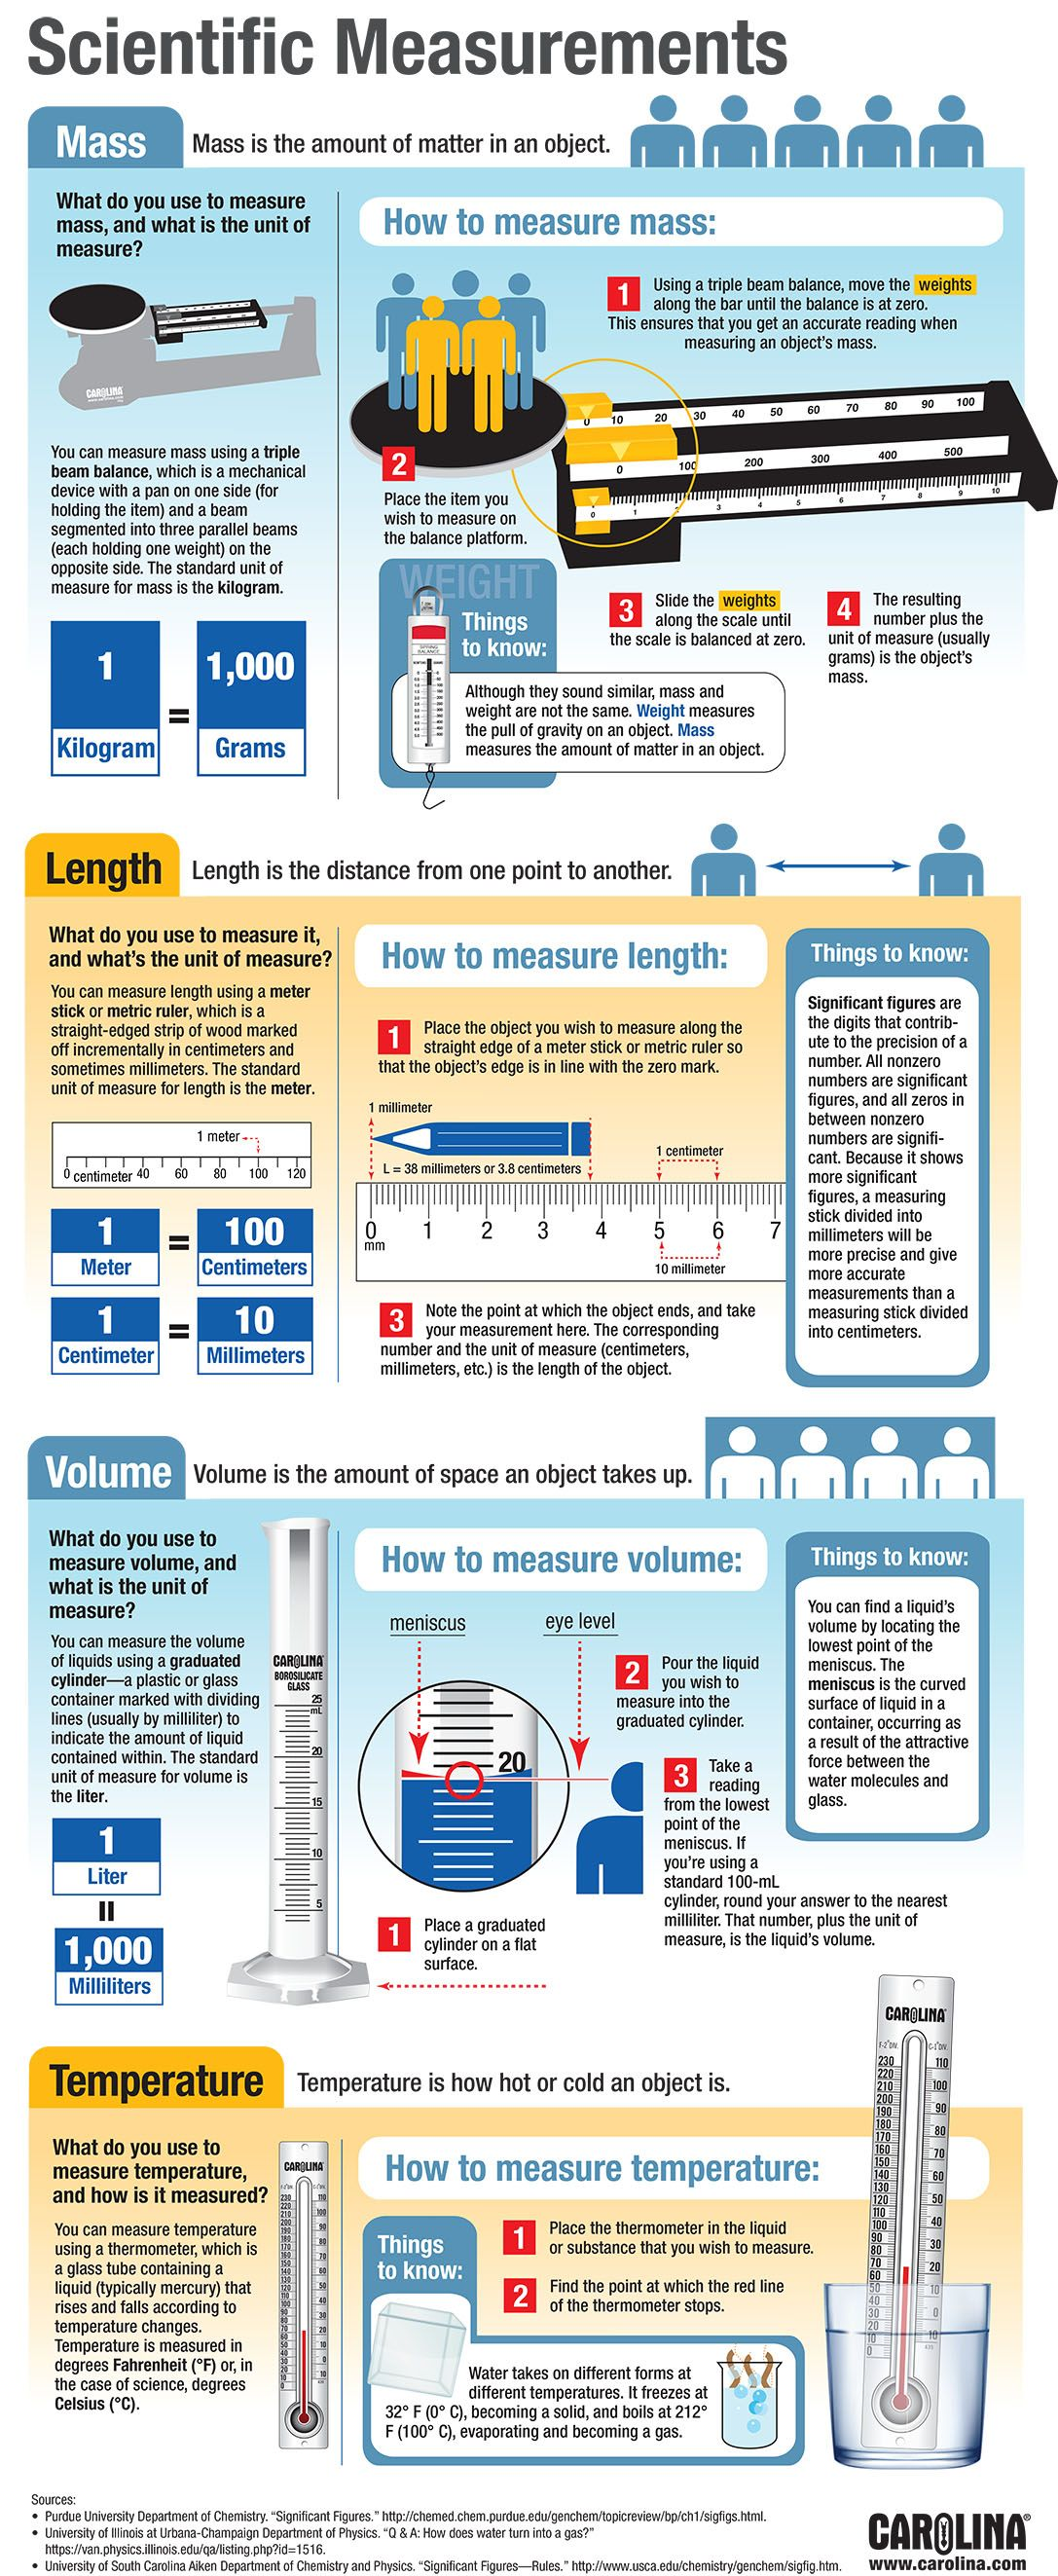 Infographic Scientific Measurements